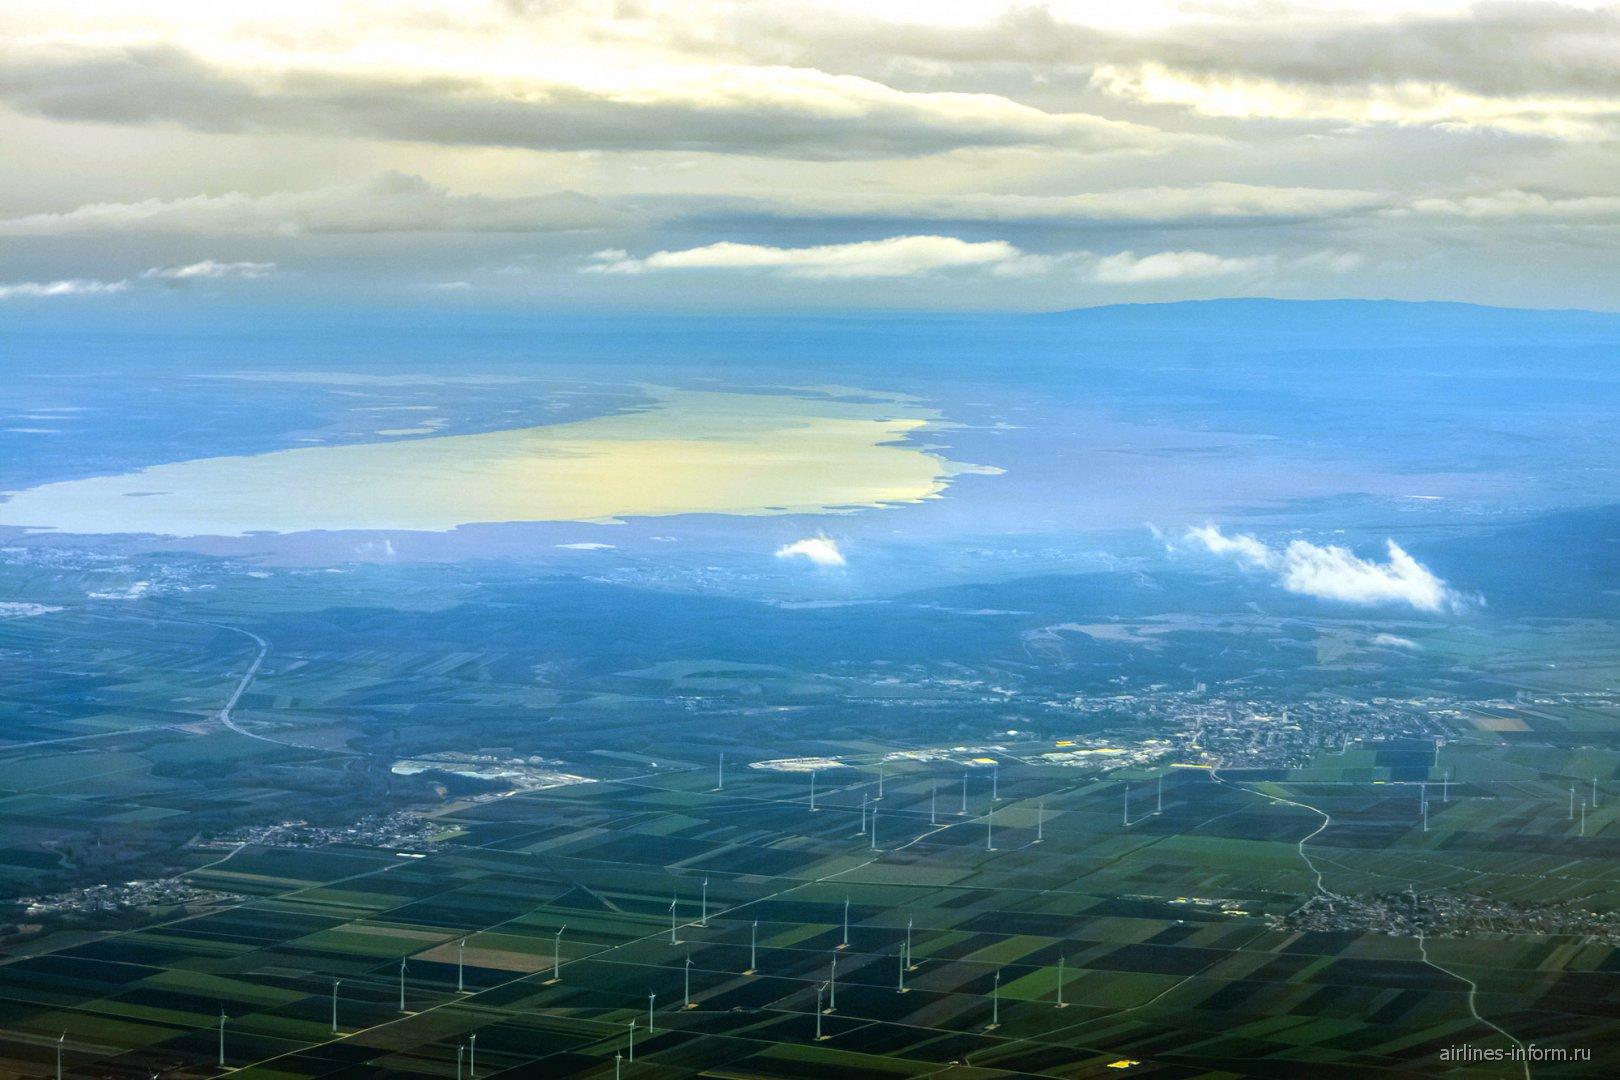 Озеро Нойзидлерзее в Австрии